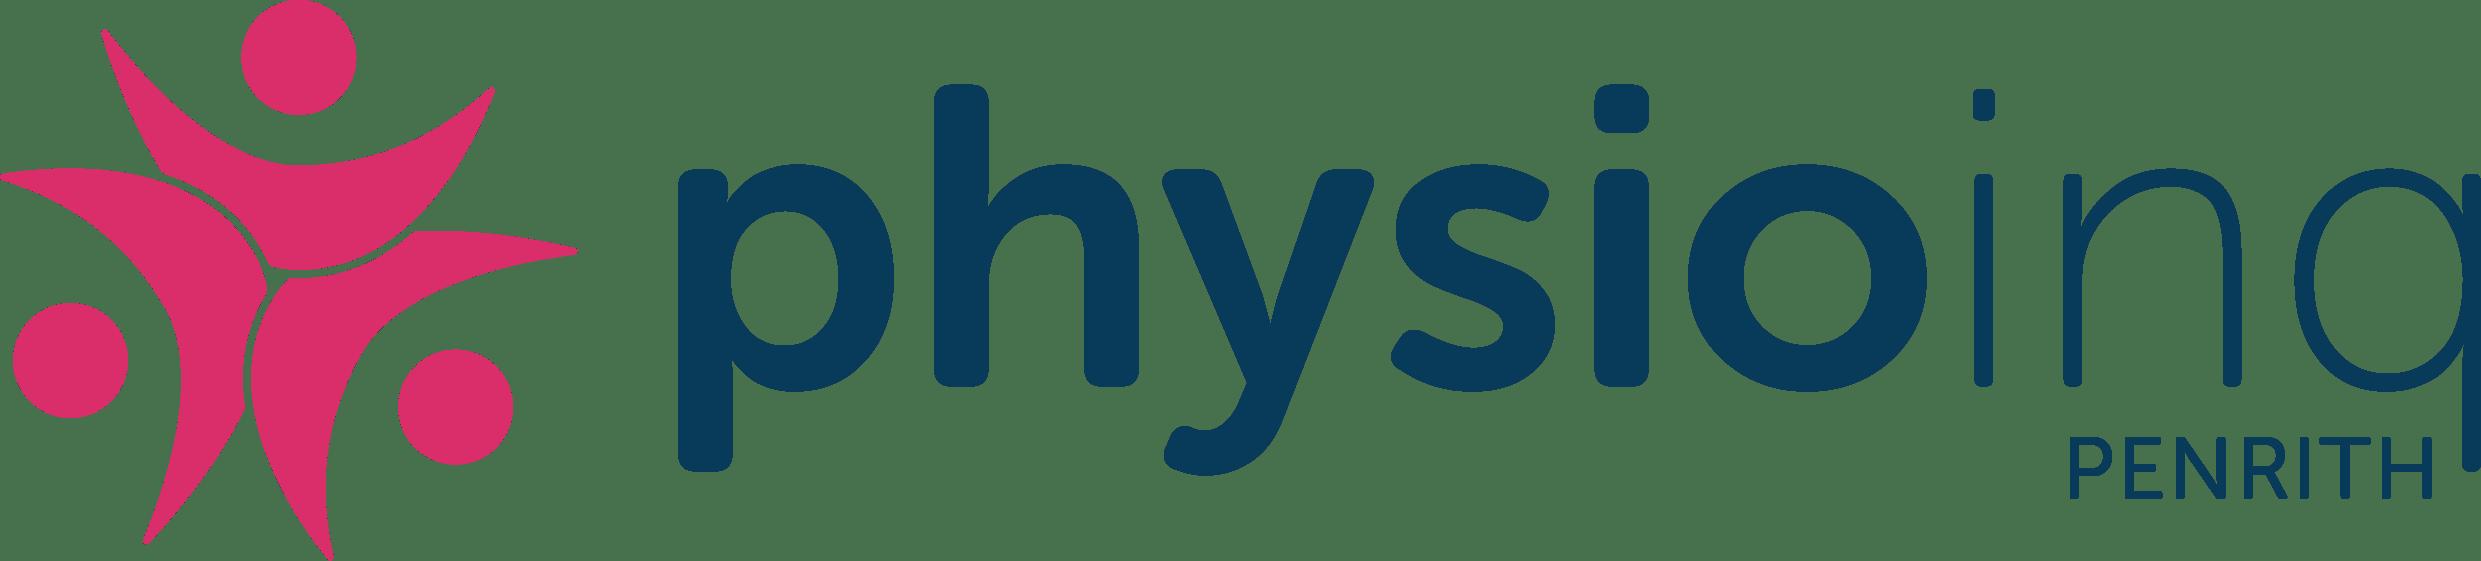 Physio Inq Penrith